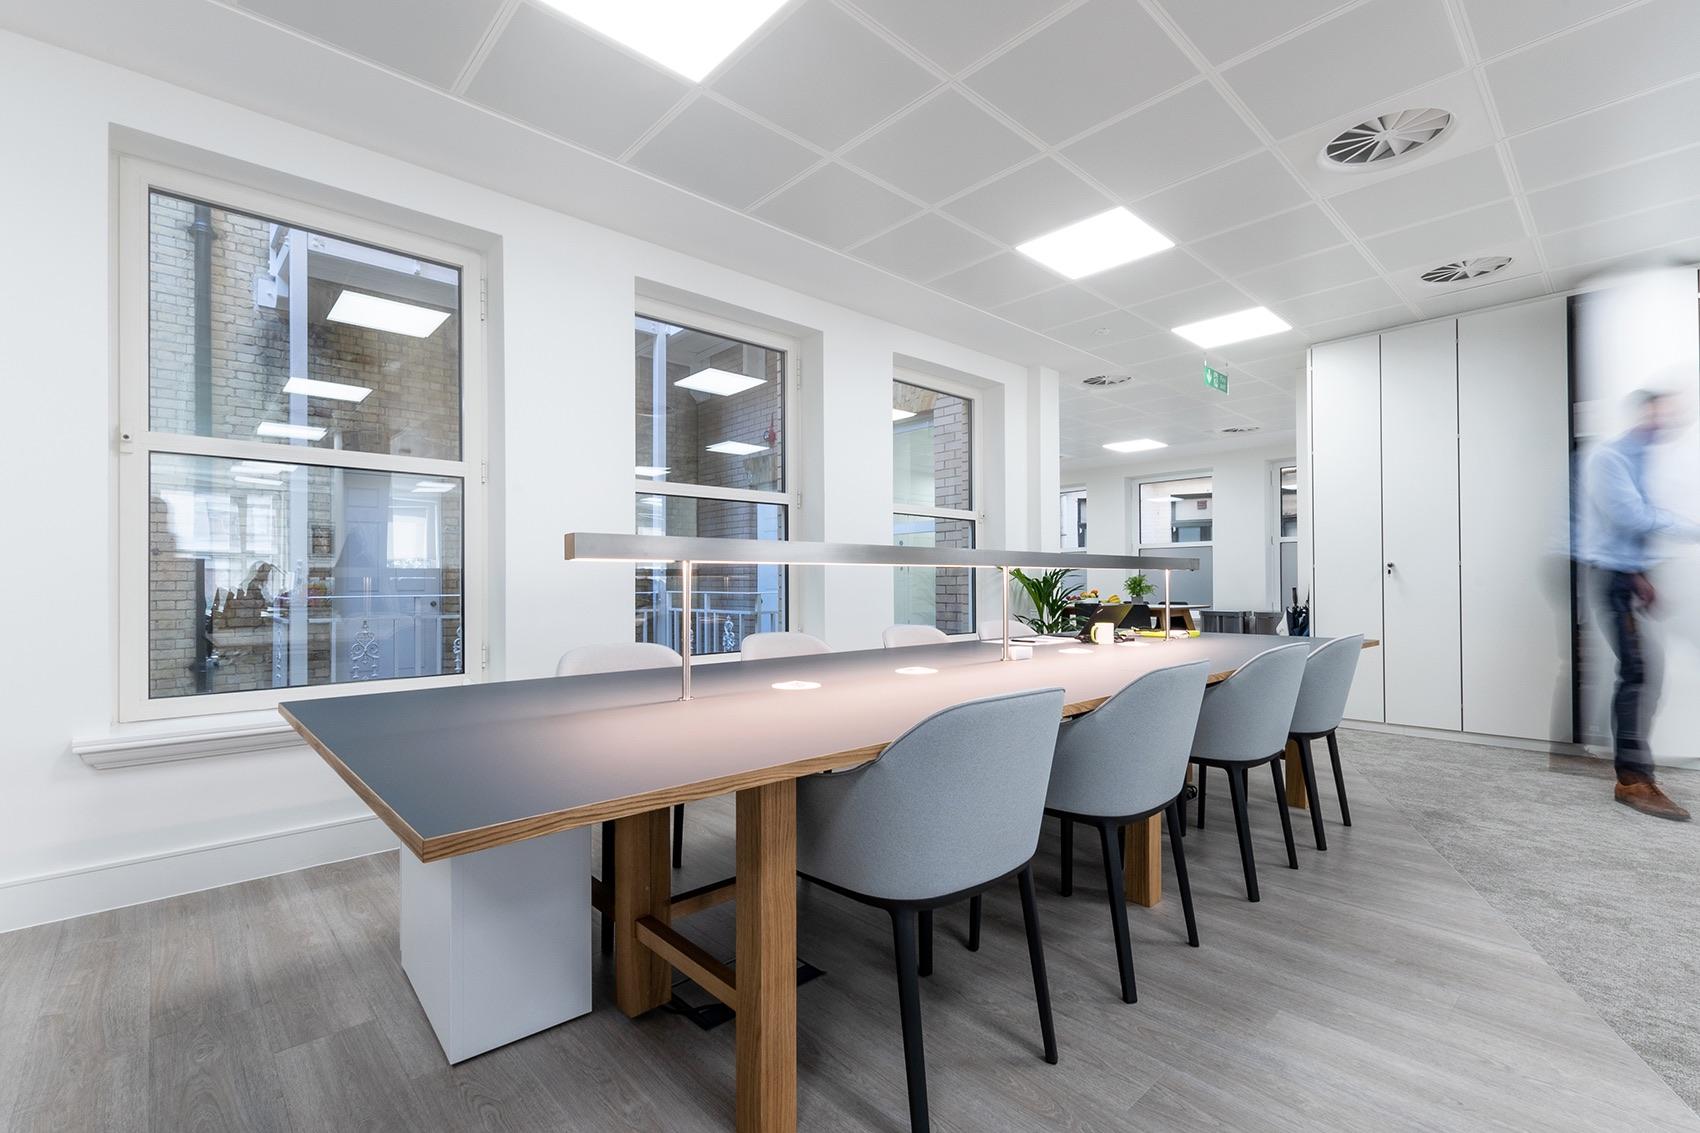 A Peek Inside Iona Capital's London Office